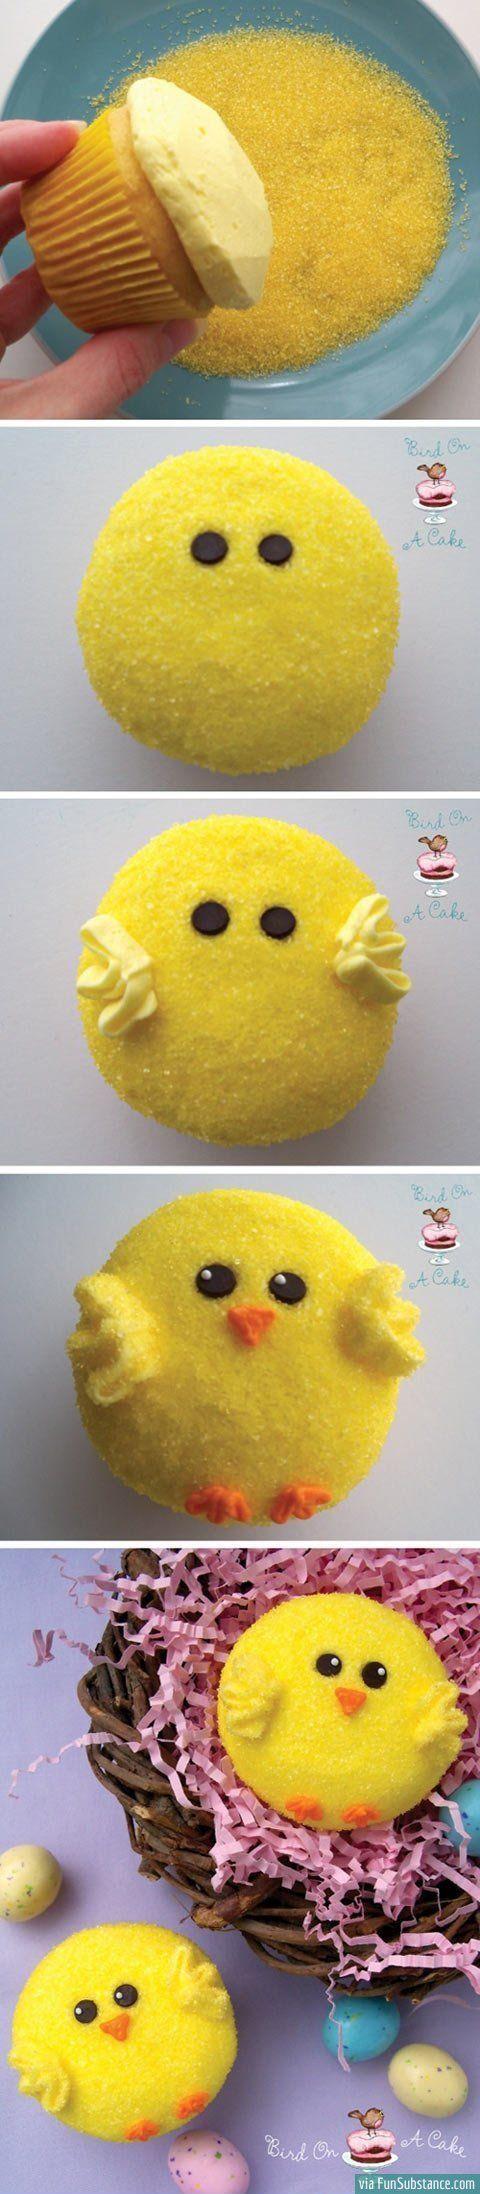 Easter Cupcake - Children | Holiday | Recipes | Kids | Parents | harrypierre.com